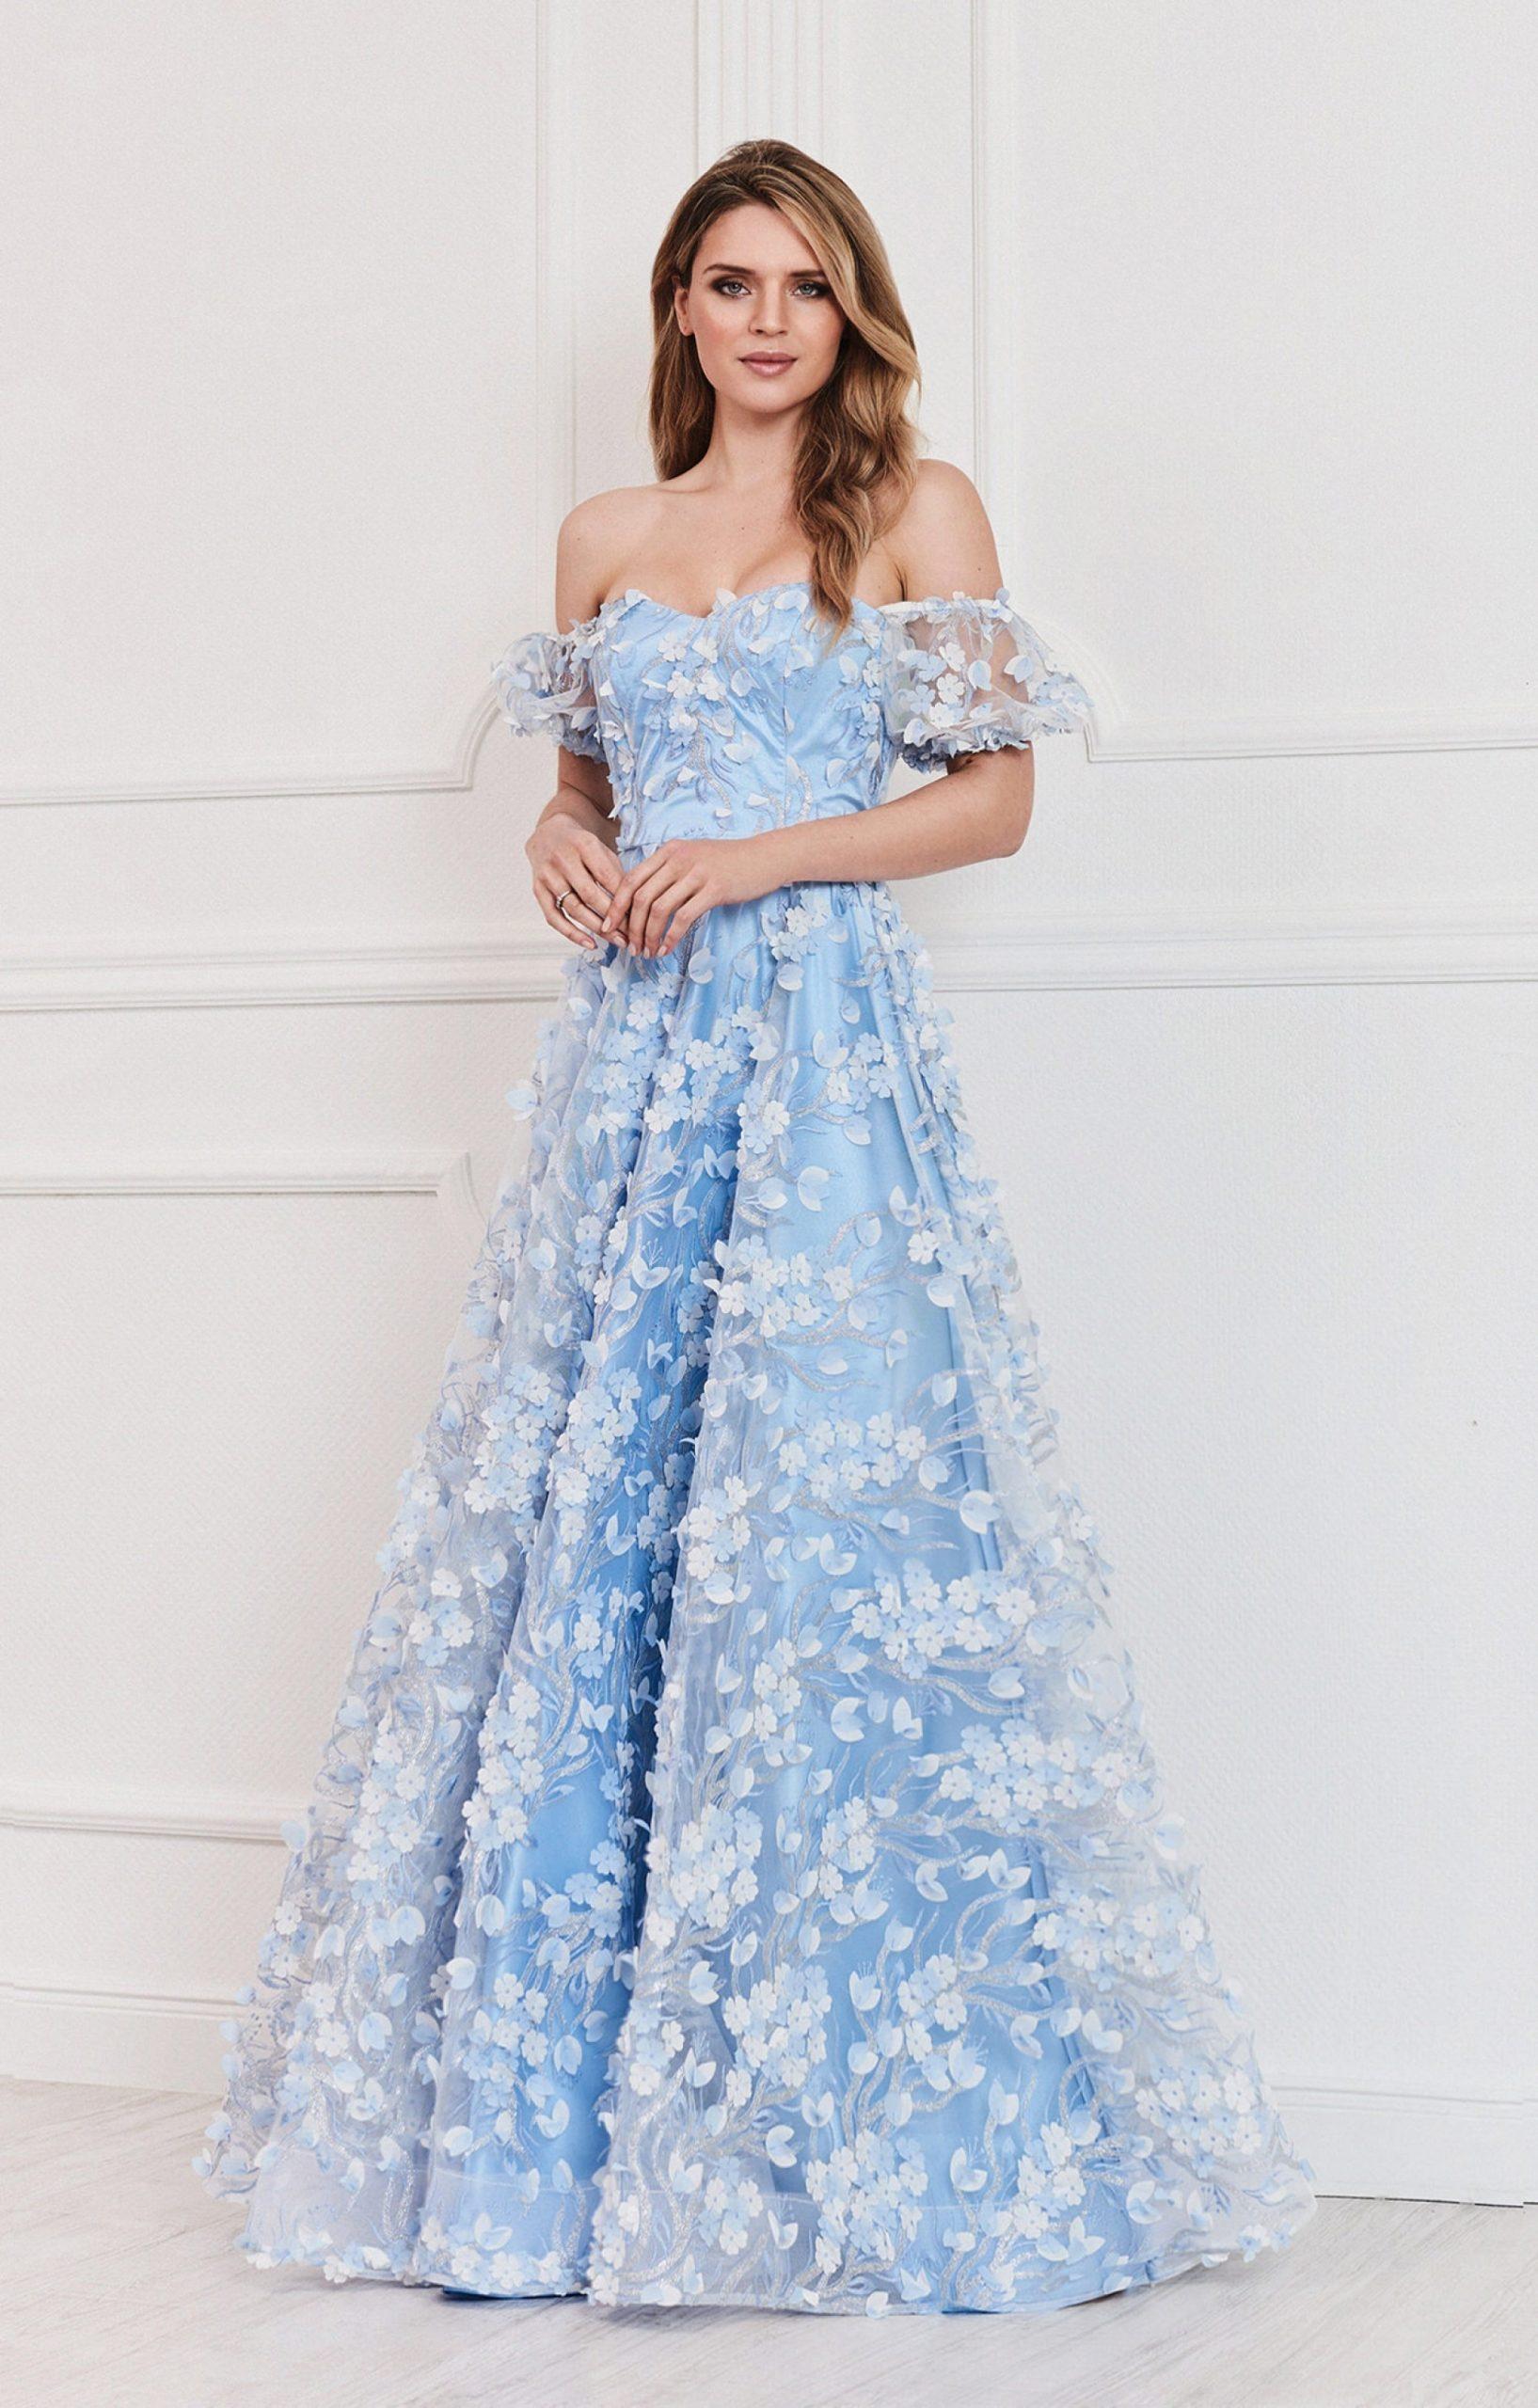 Designer Schön Abendkleid In Blau Bester Preis20 Elegant Abendkleid In Blau Spezialgebiet